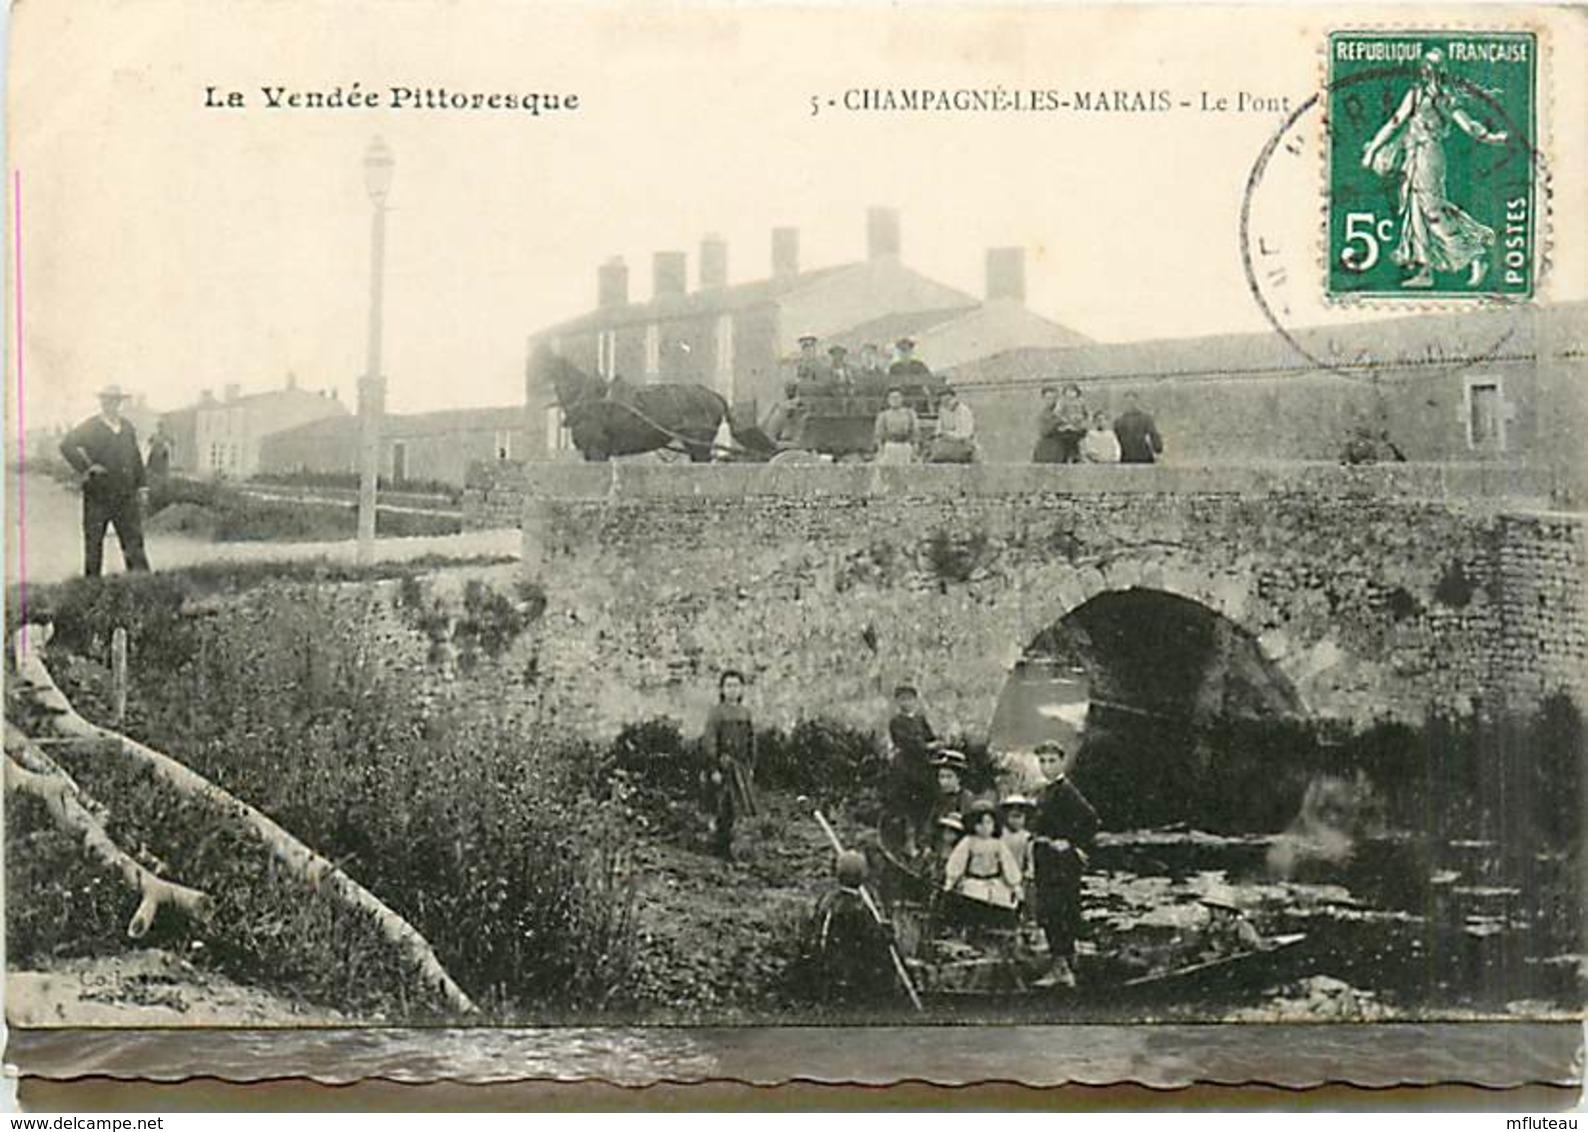 85* CHAMPAGNE LES MARAIS Pont                   MA97,0624 - France